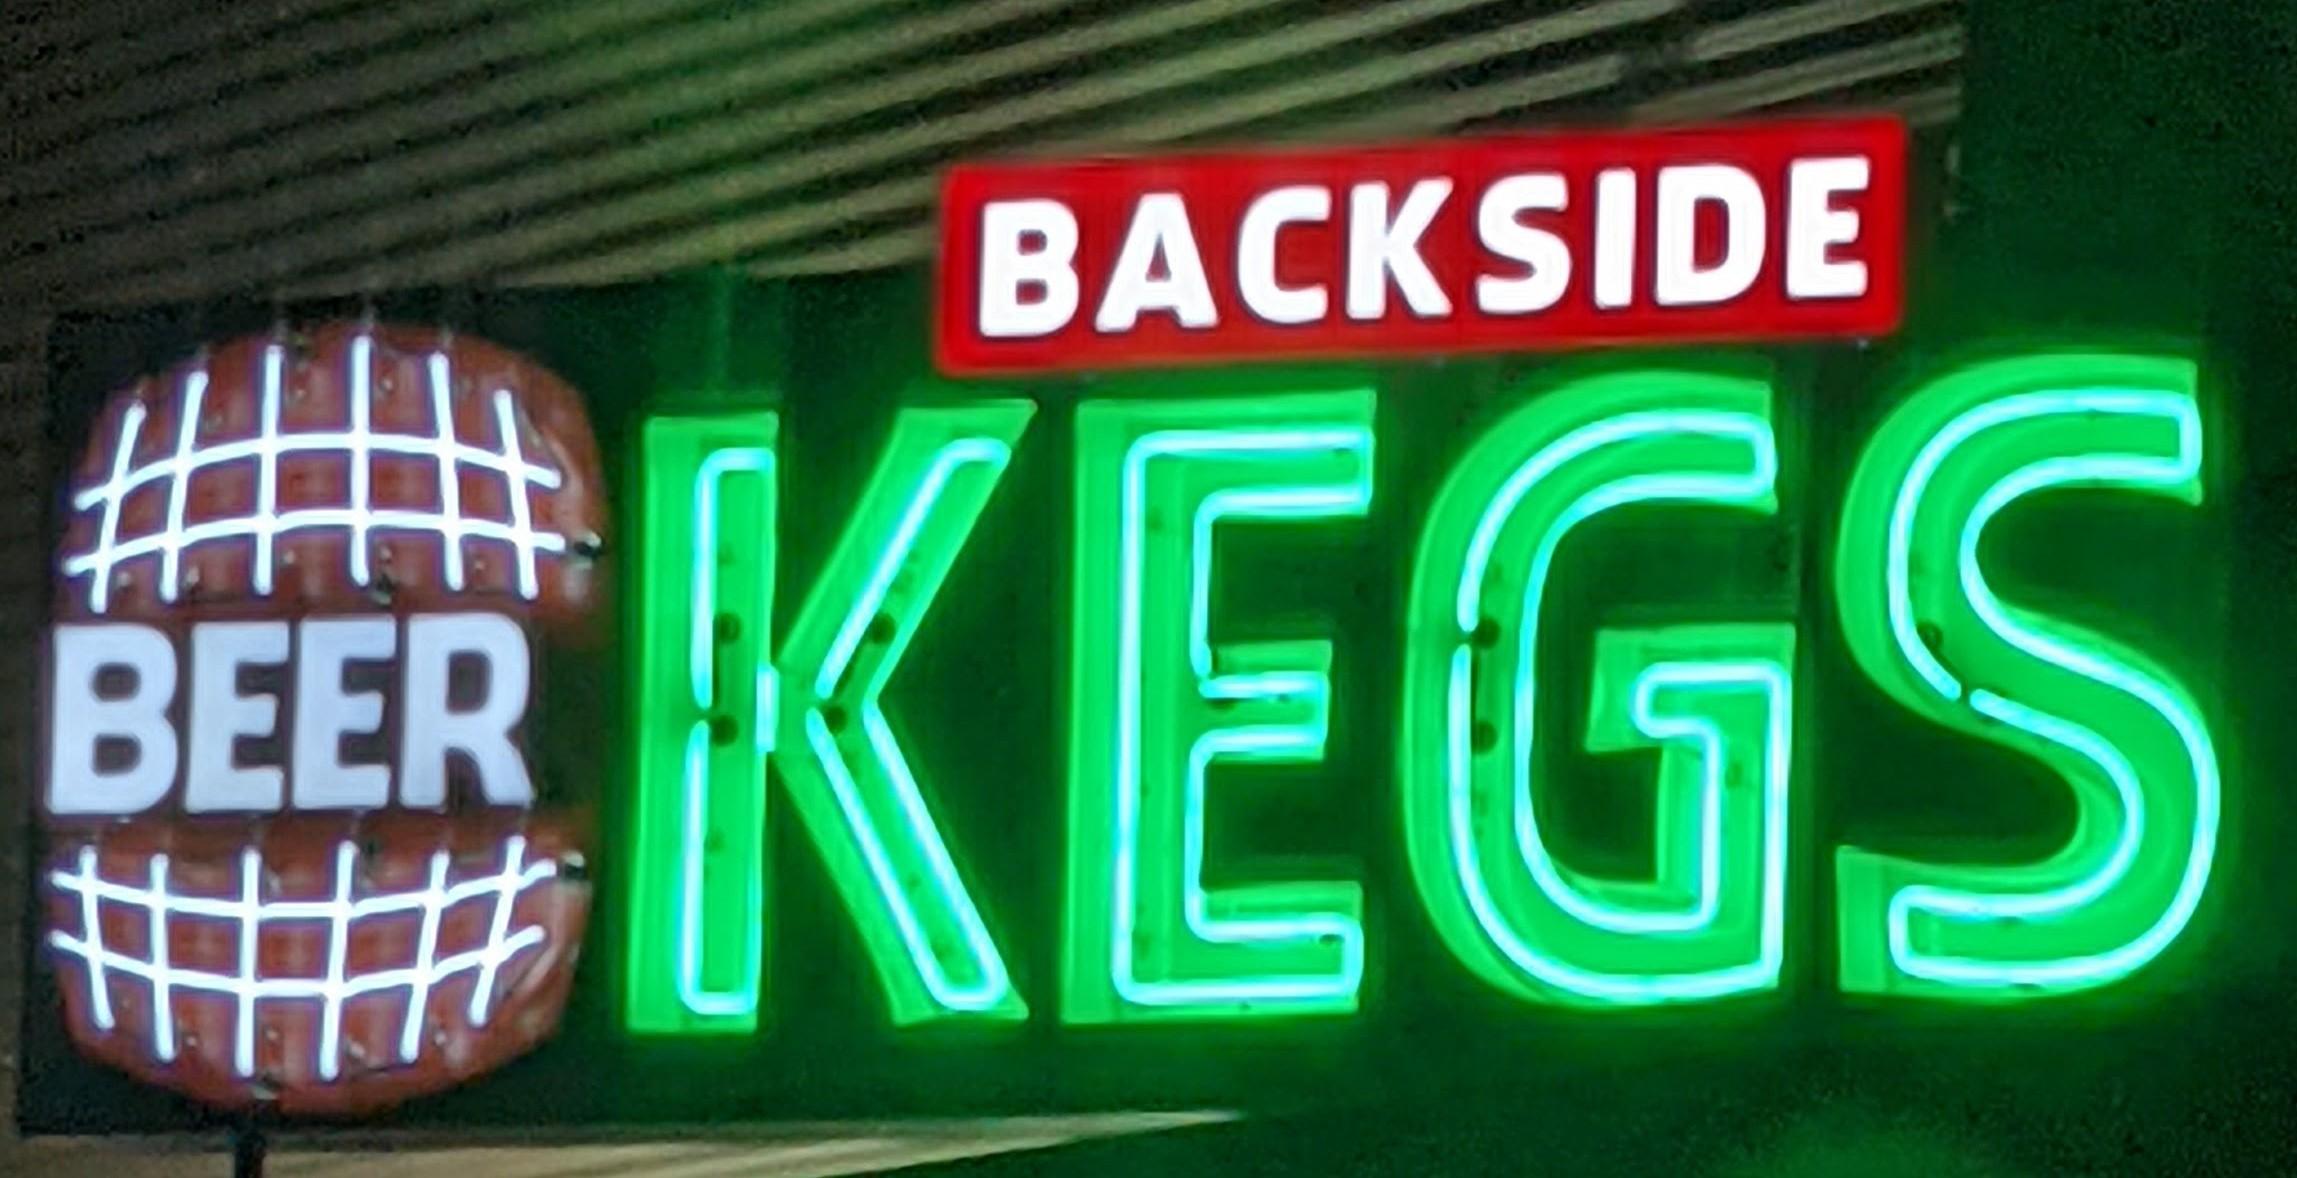 Backside Kegs